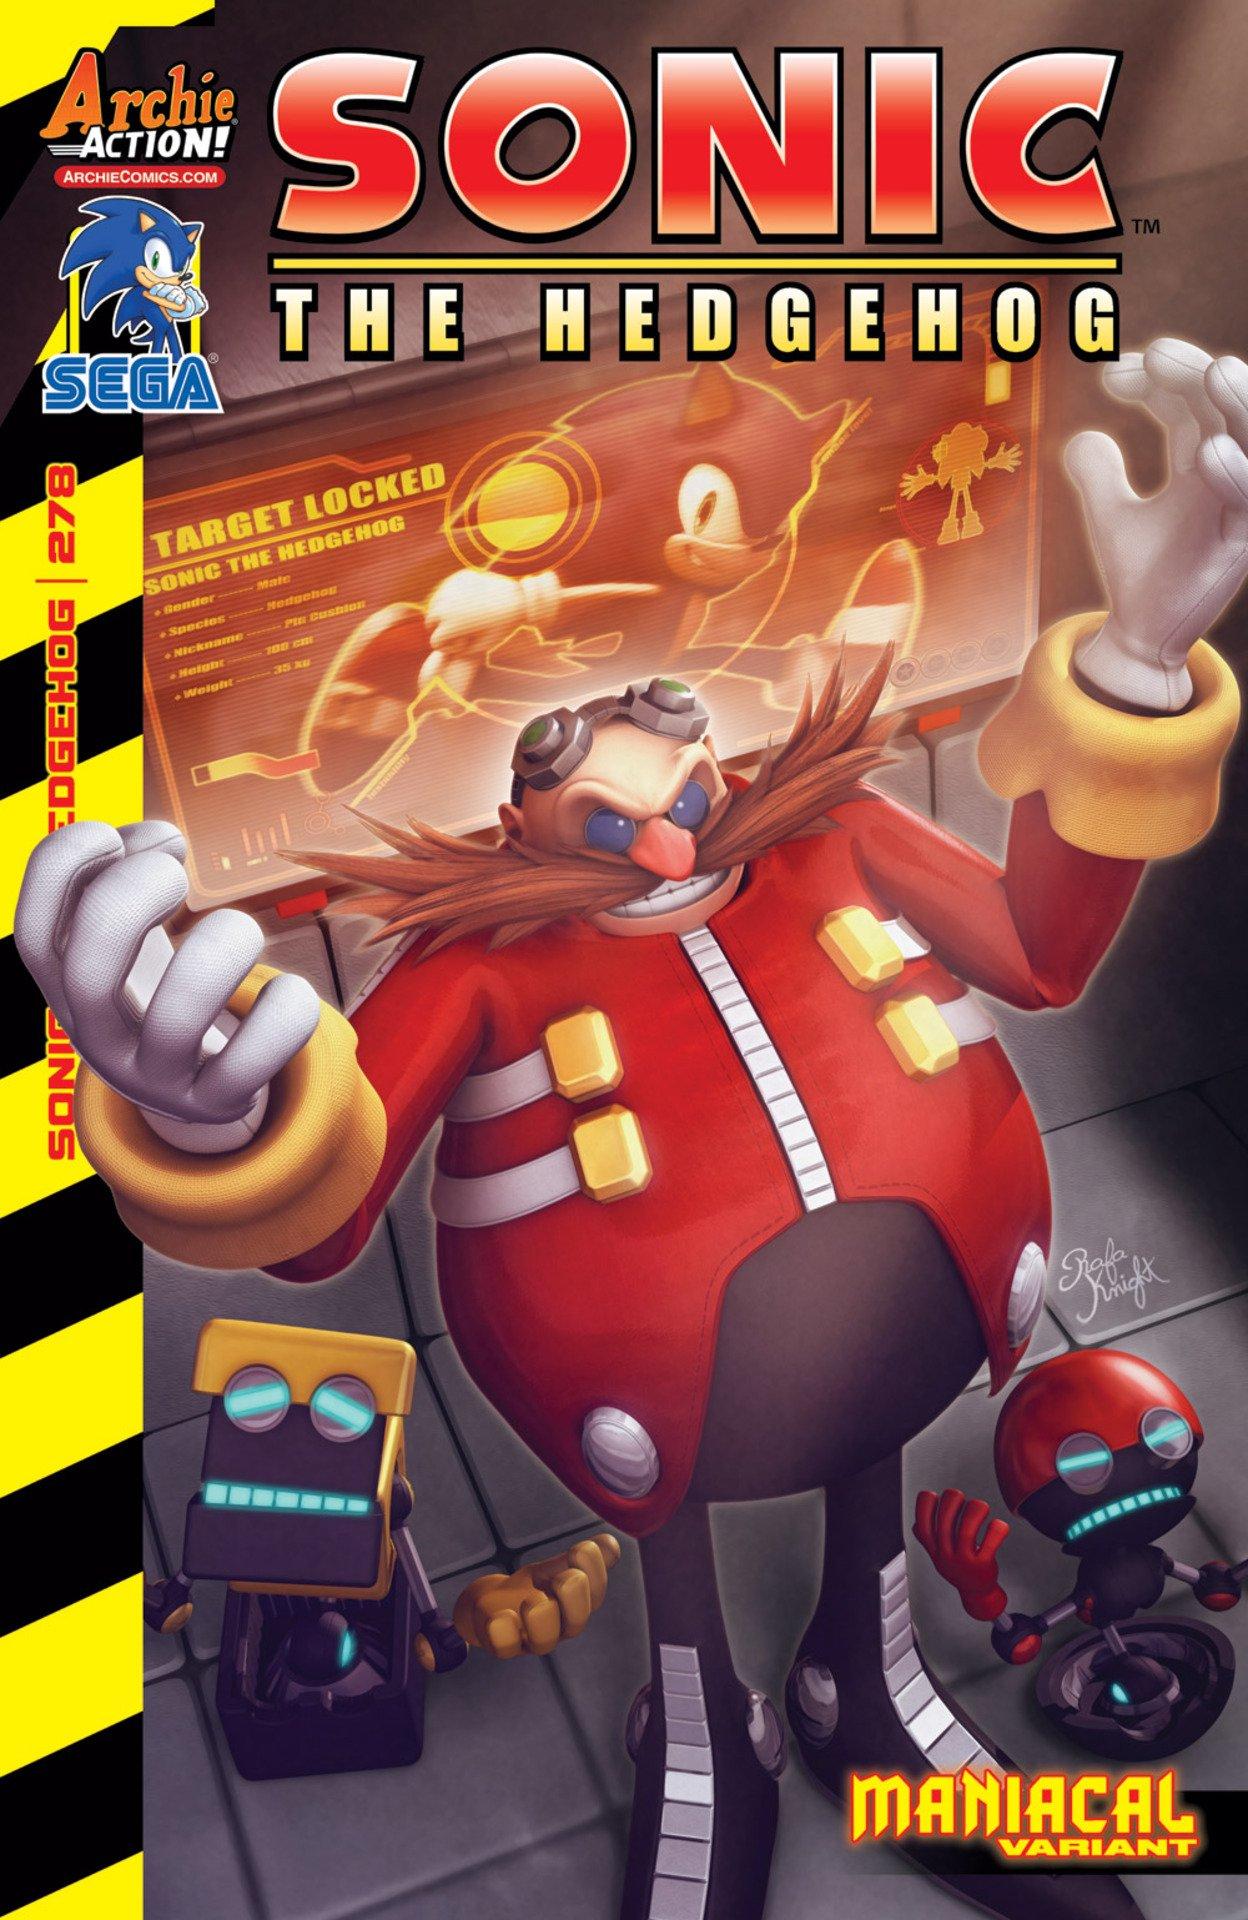 Sonic the Hedgehog 278 (January 2016) (variant edition)